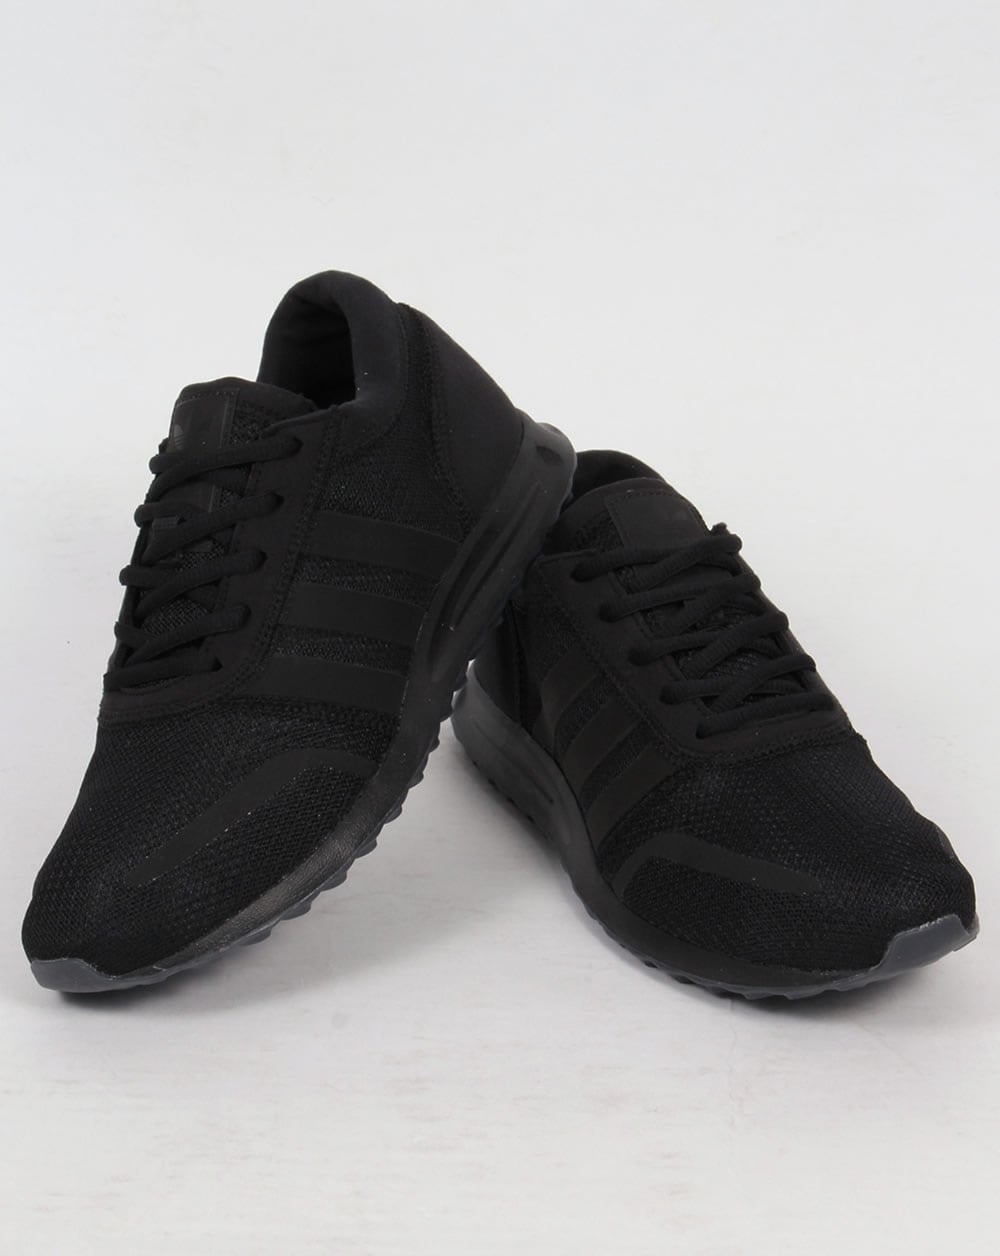 Adidas Los Angeles Trainers Triple Black,originals,mens,retro